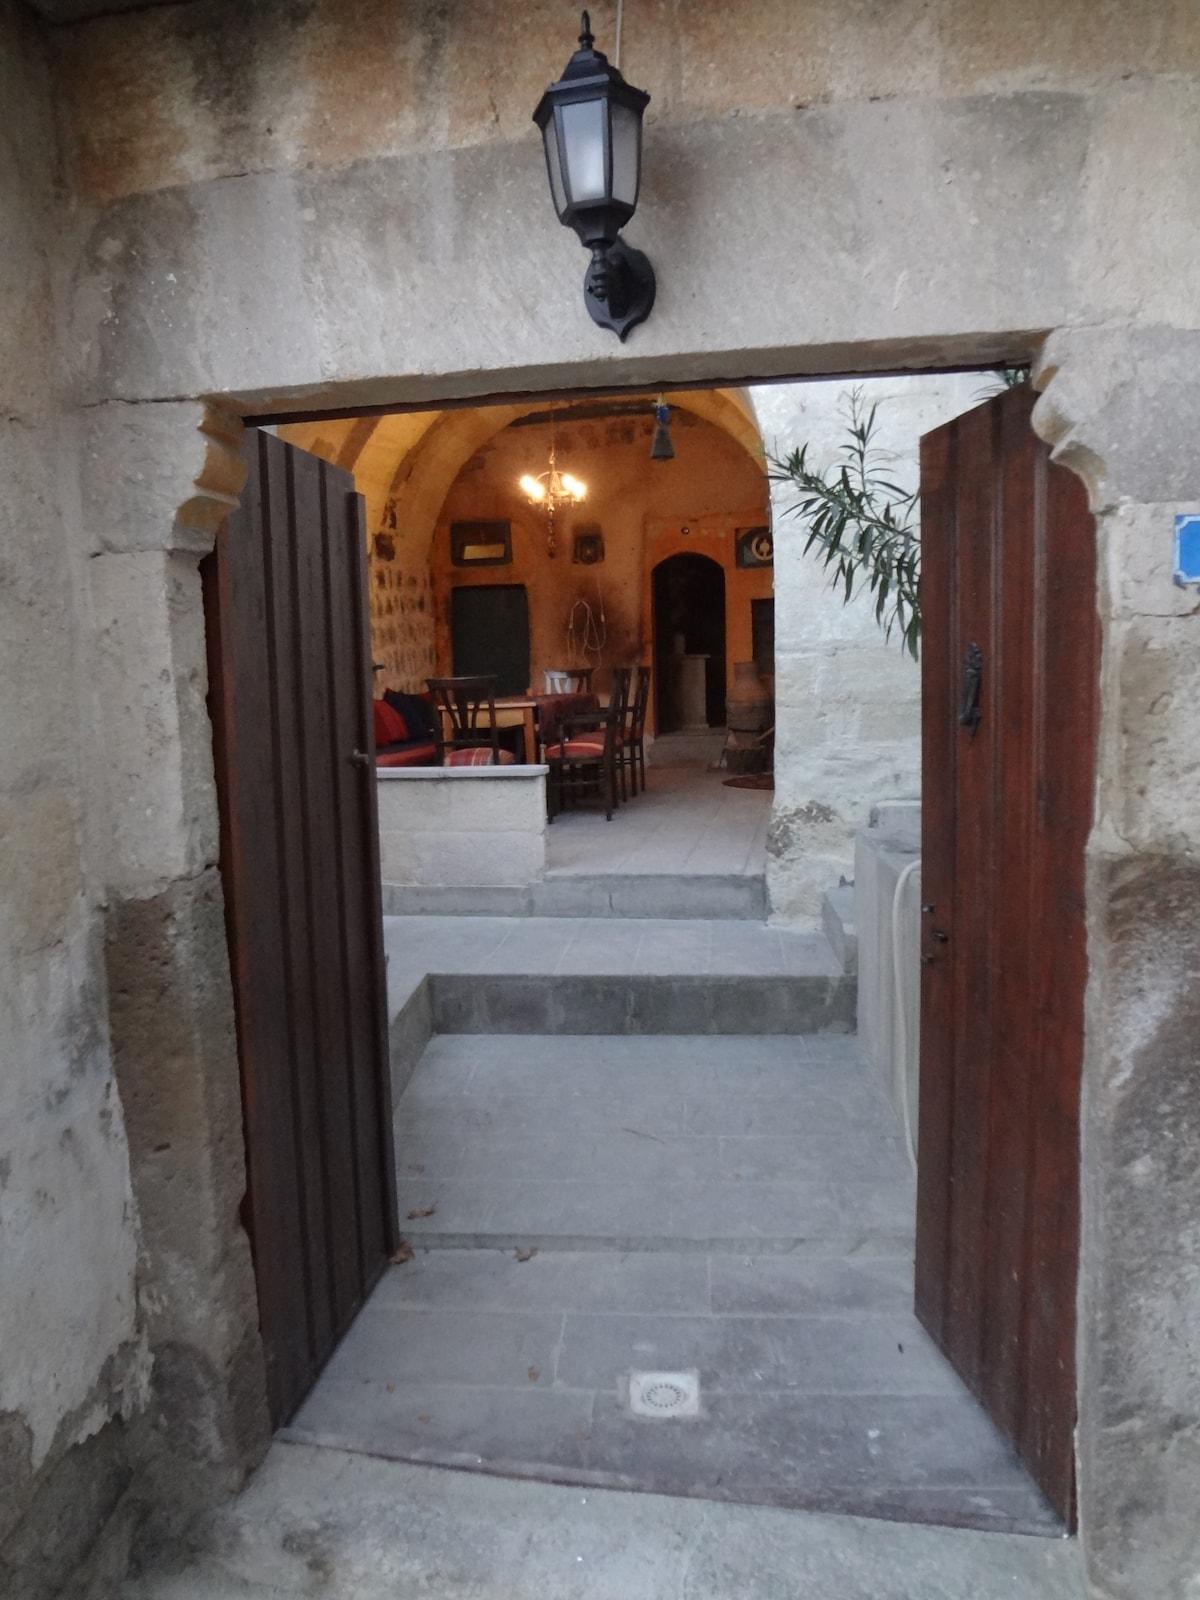 Enter through the porch, over the courtyard and into the house.